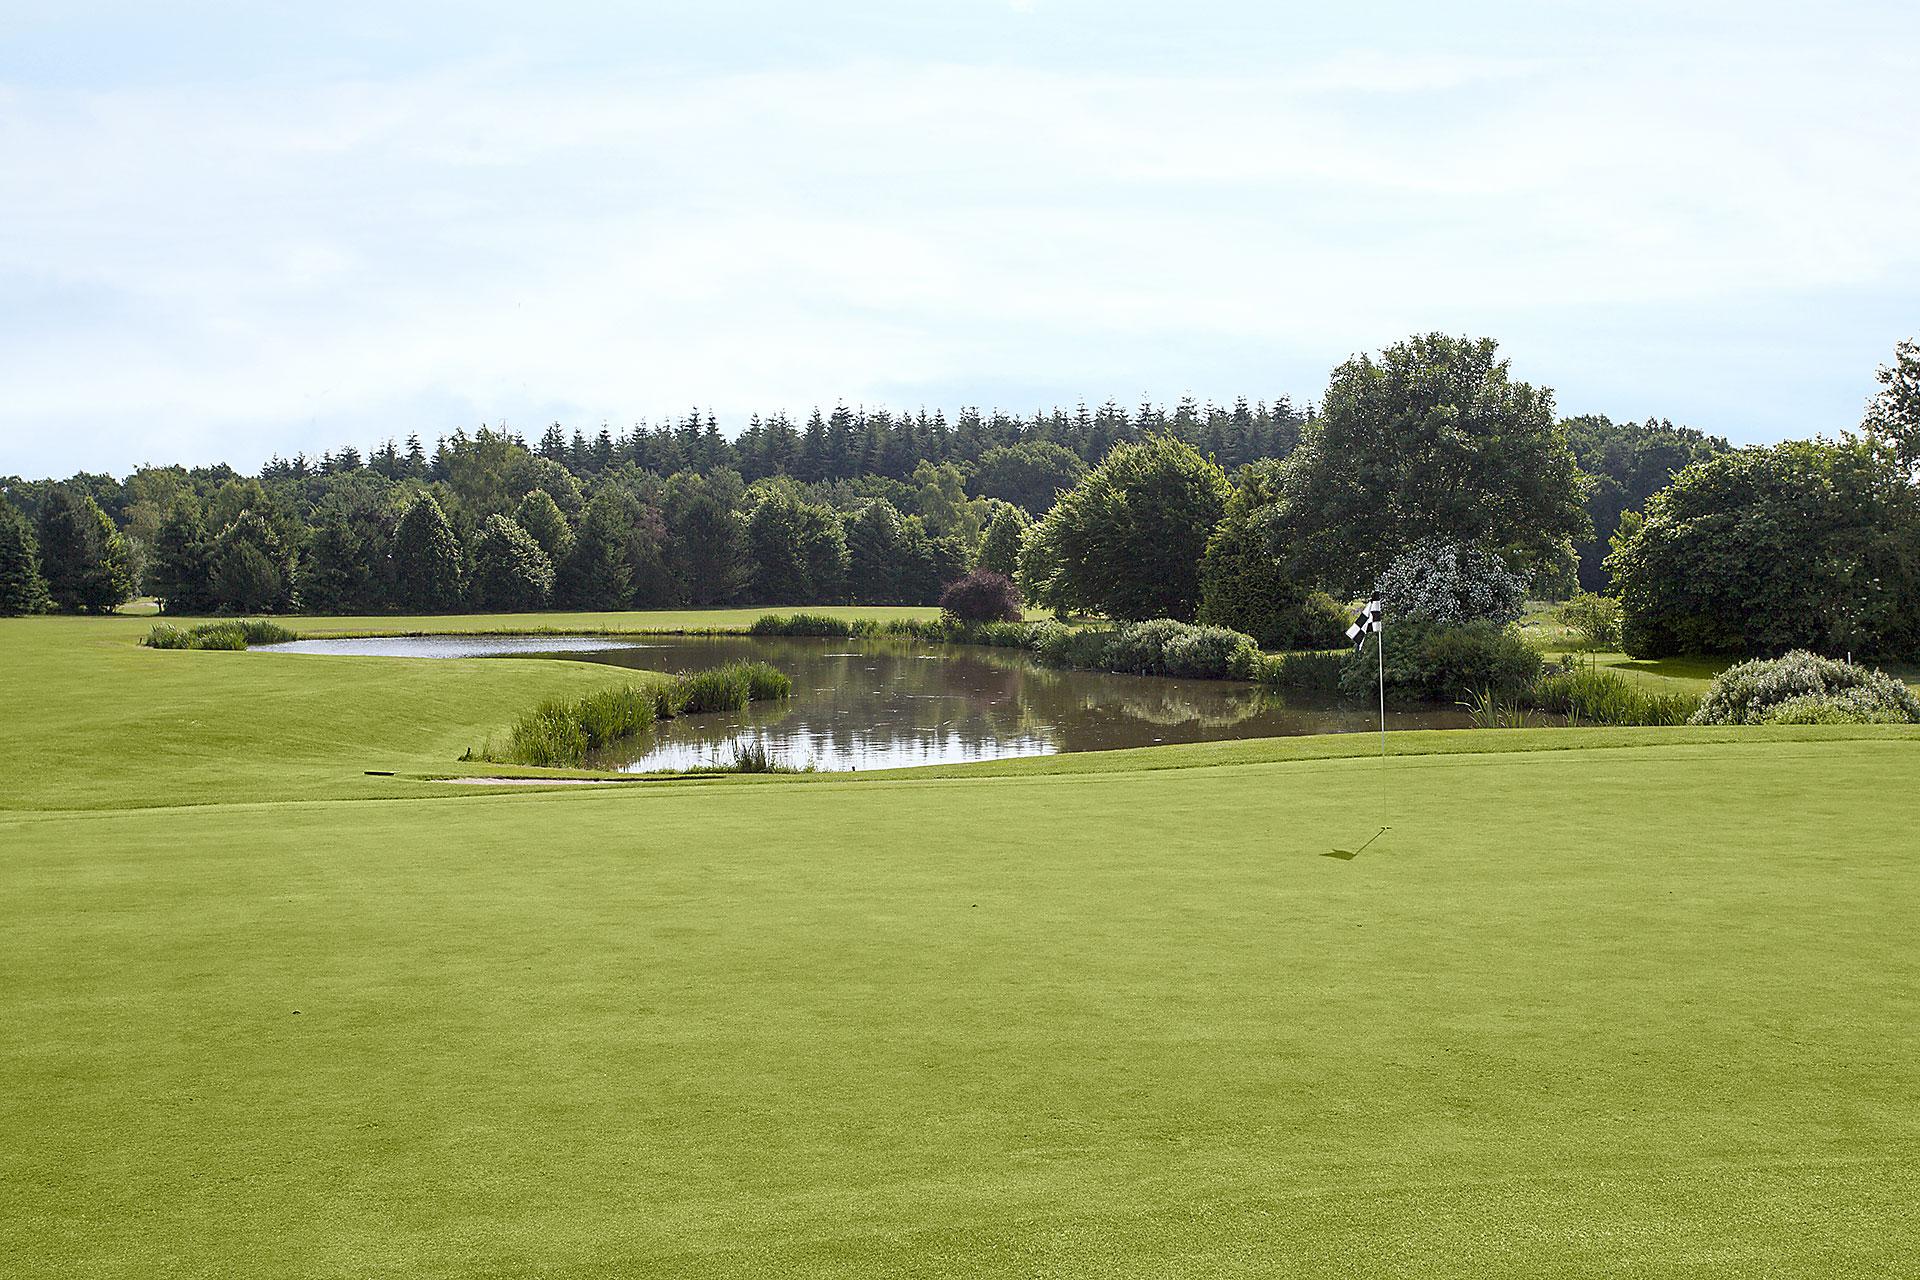 Greenkeeping-golfplatz